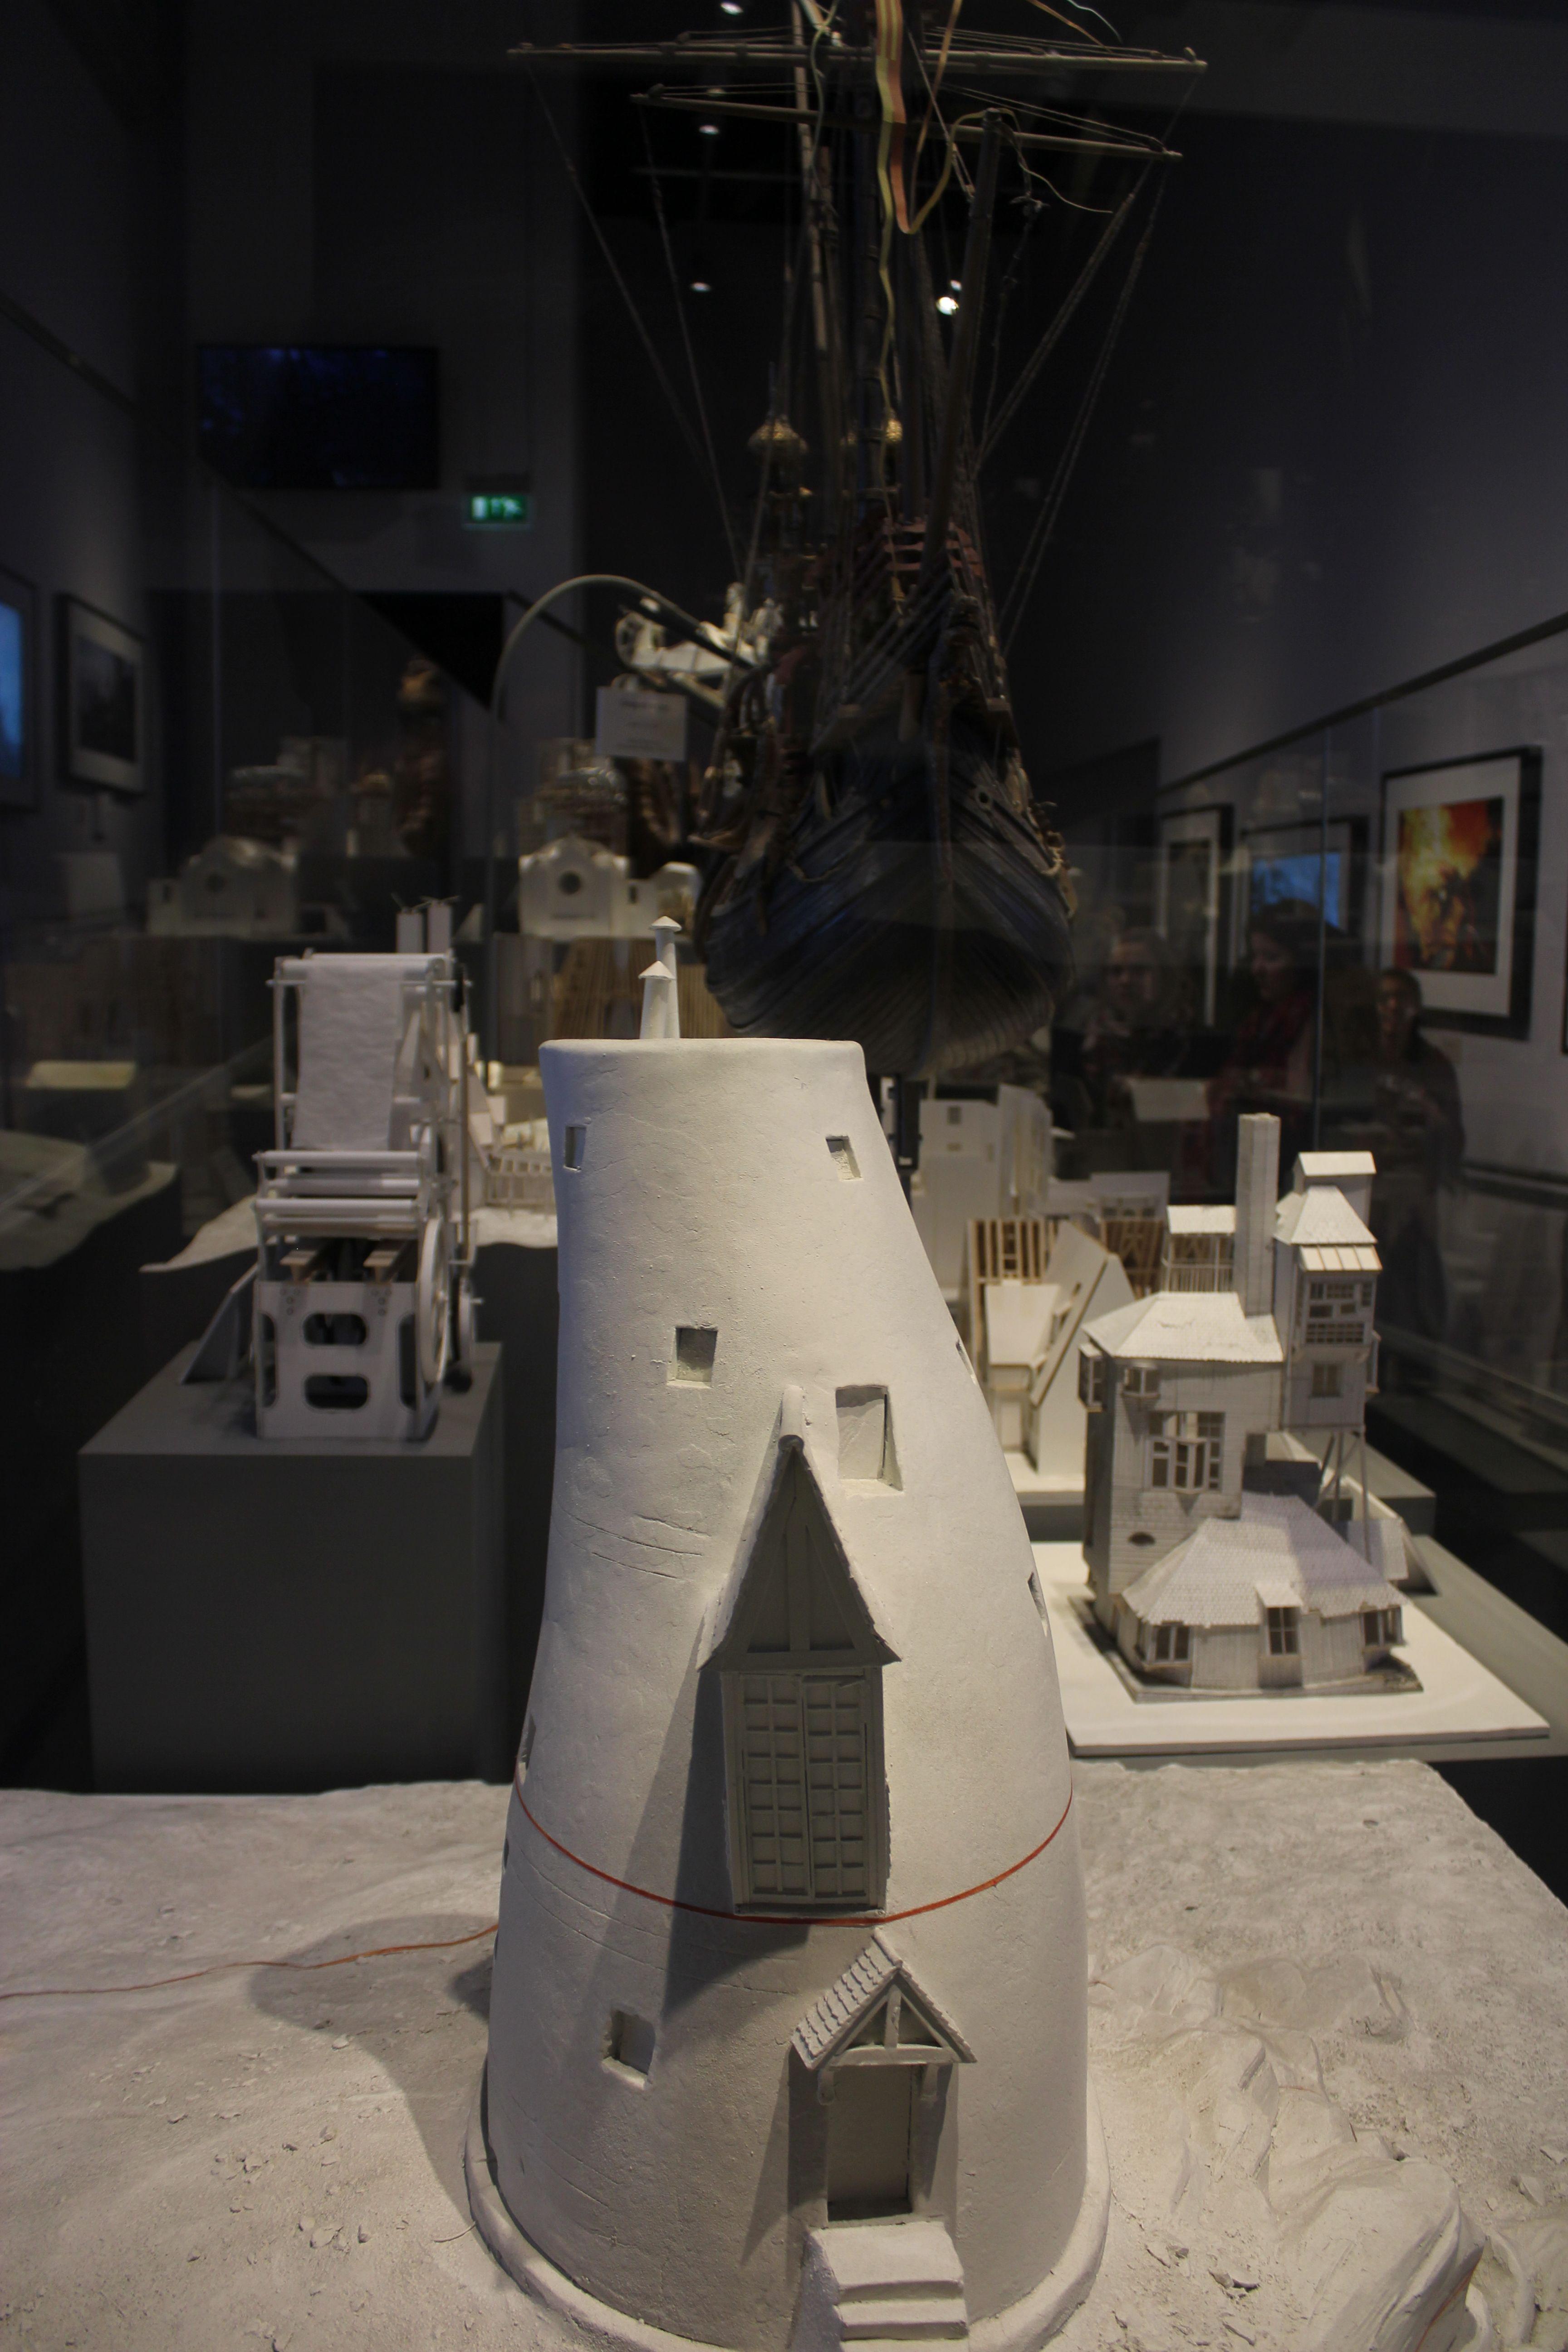 Cardboard scale models art design harry potter studios